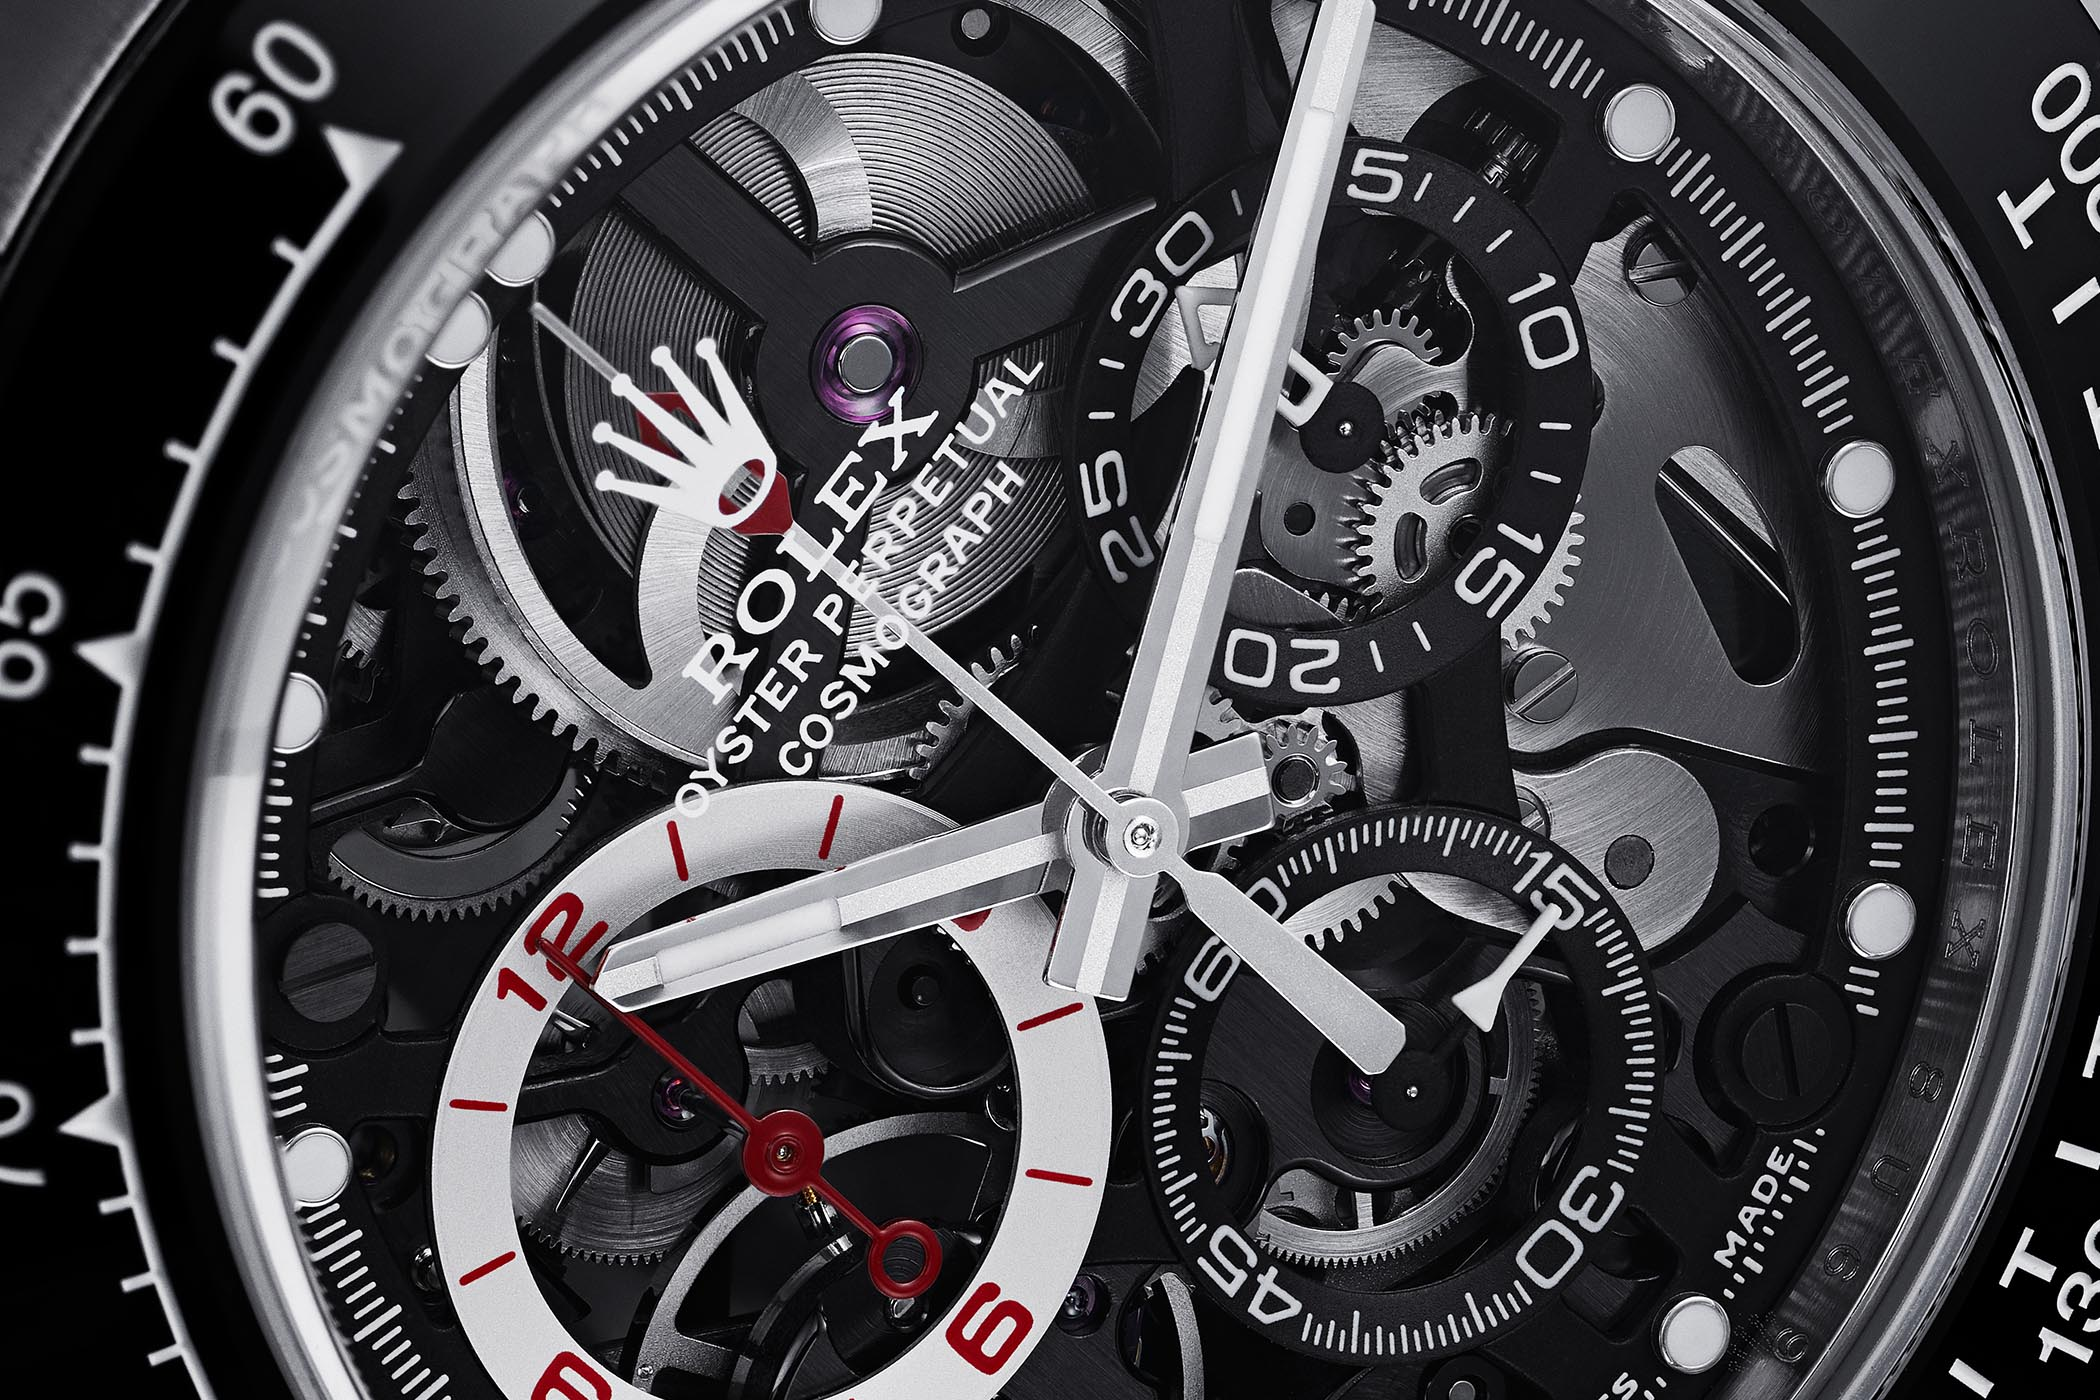 Artisans de Genève, Rubens Barrichello, La Barrichello, Daytona, F1 car, unique movement, particular shapes, exceptional curves, extraordinary mechanism, racing world, watch, luxury, luxury watch, billionaire, race, technical prowess, rolex, watchmaking, timepiece, cutting-edge technology, F1,